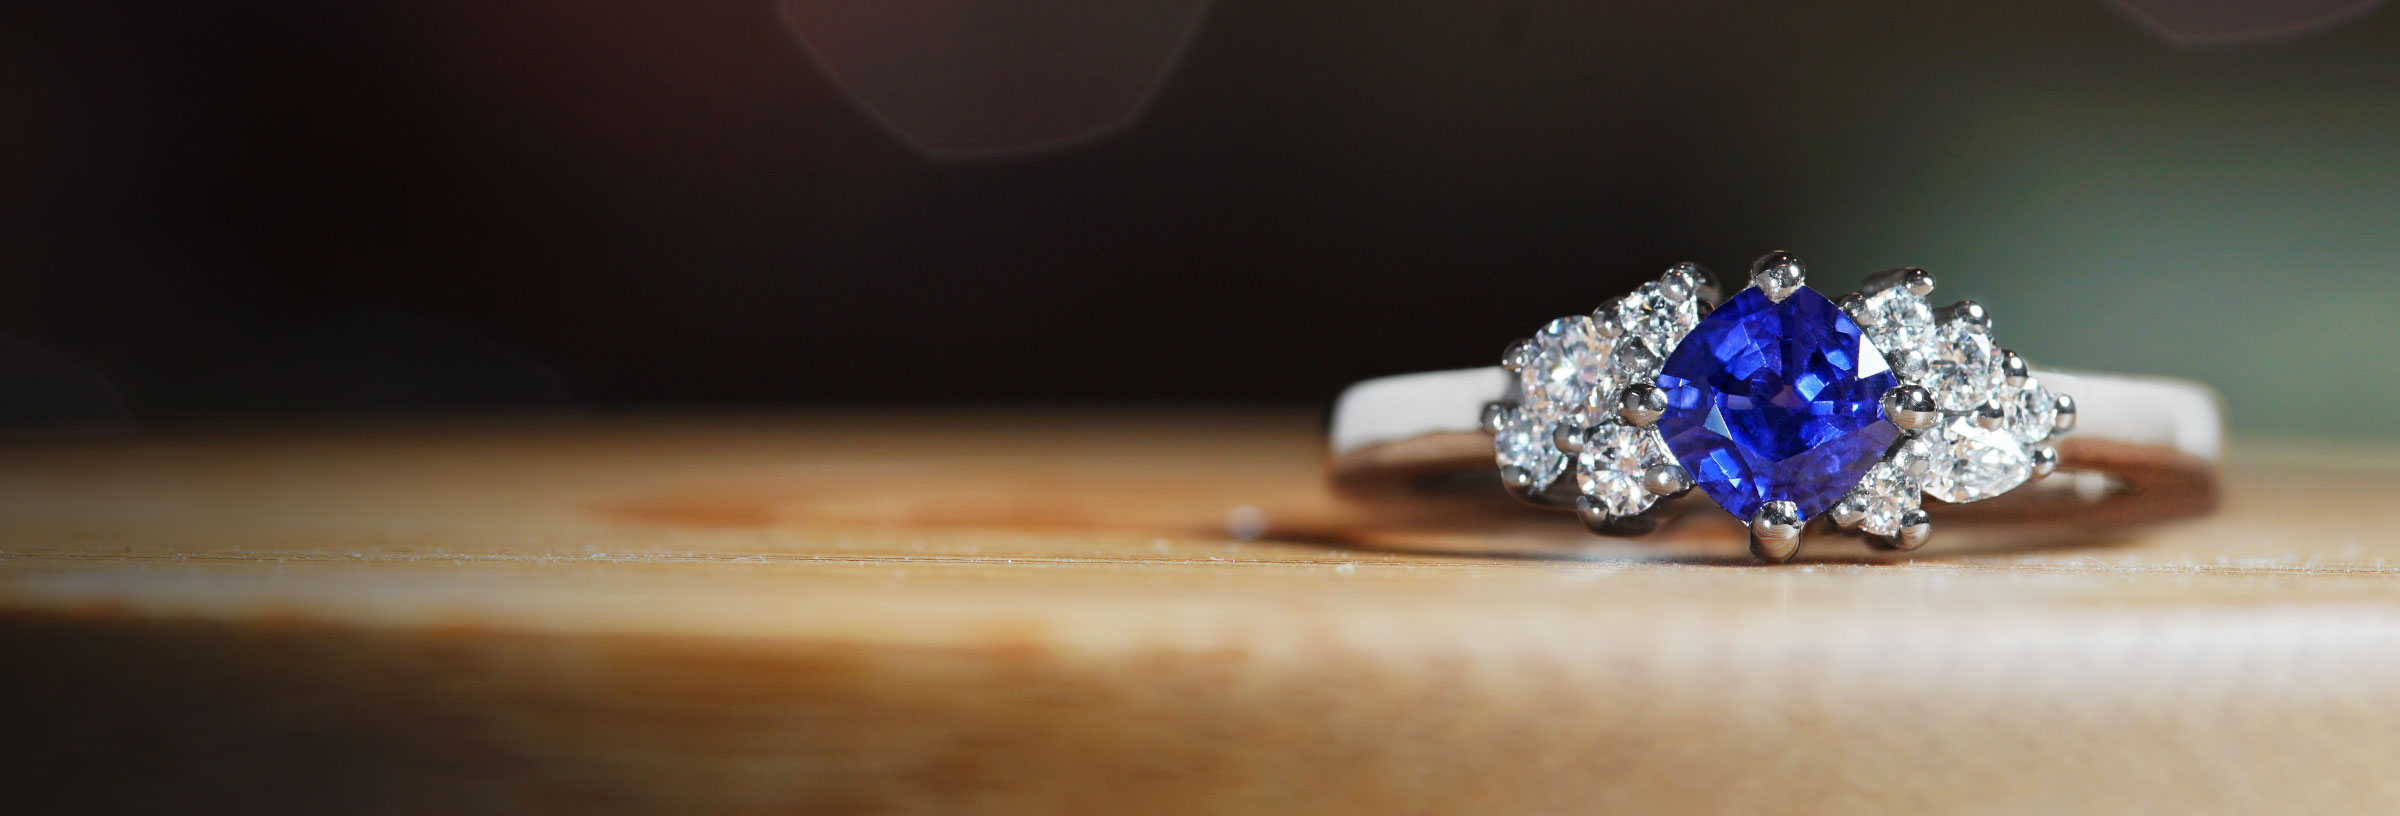 palladium-sapphire-and-multicut-diamond-cluster-engagement-ring